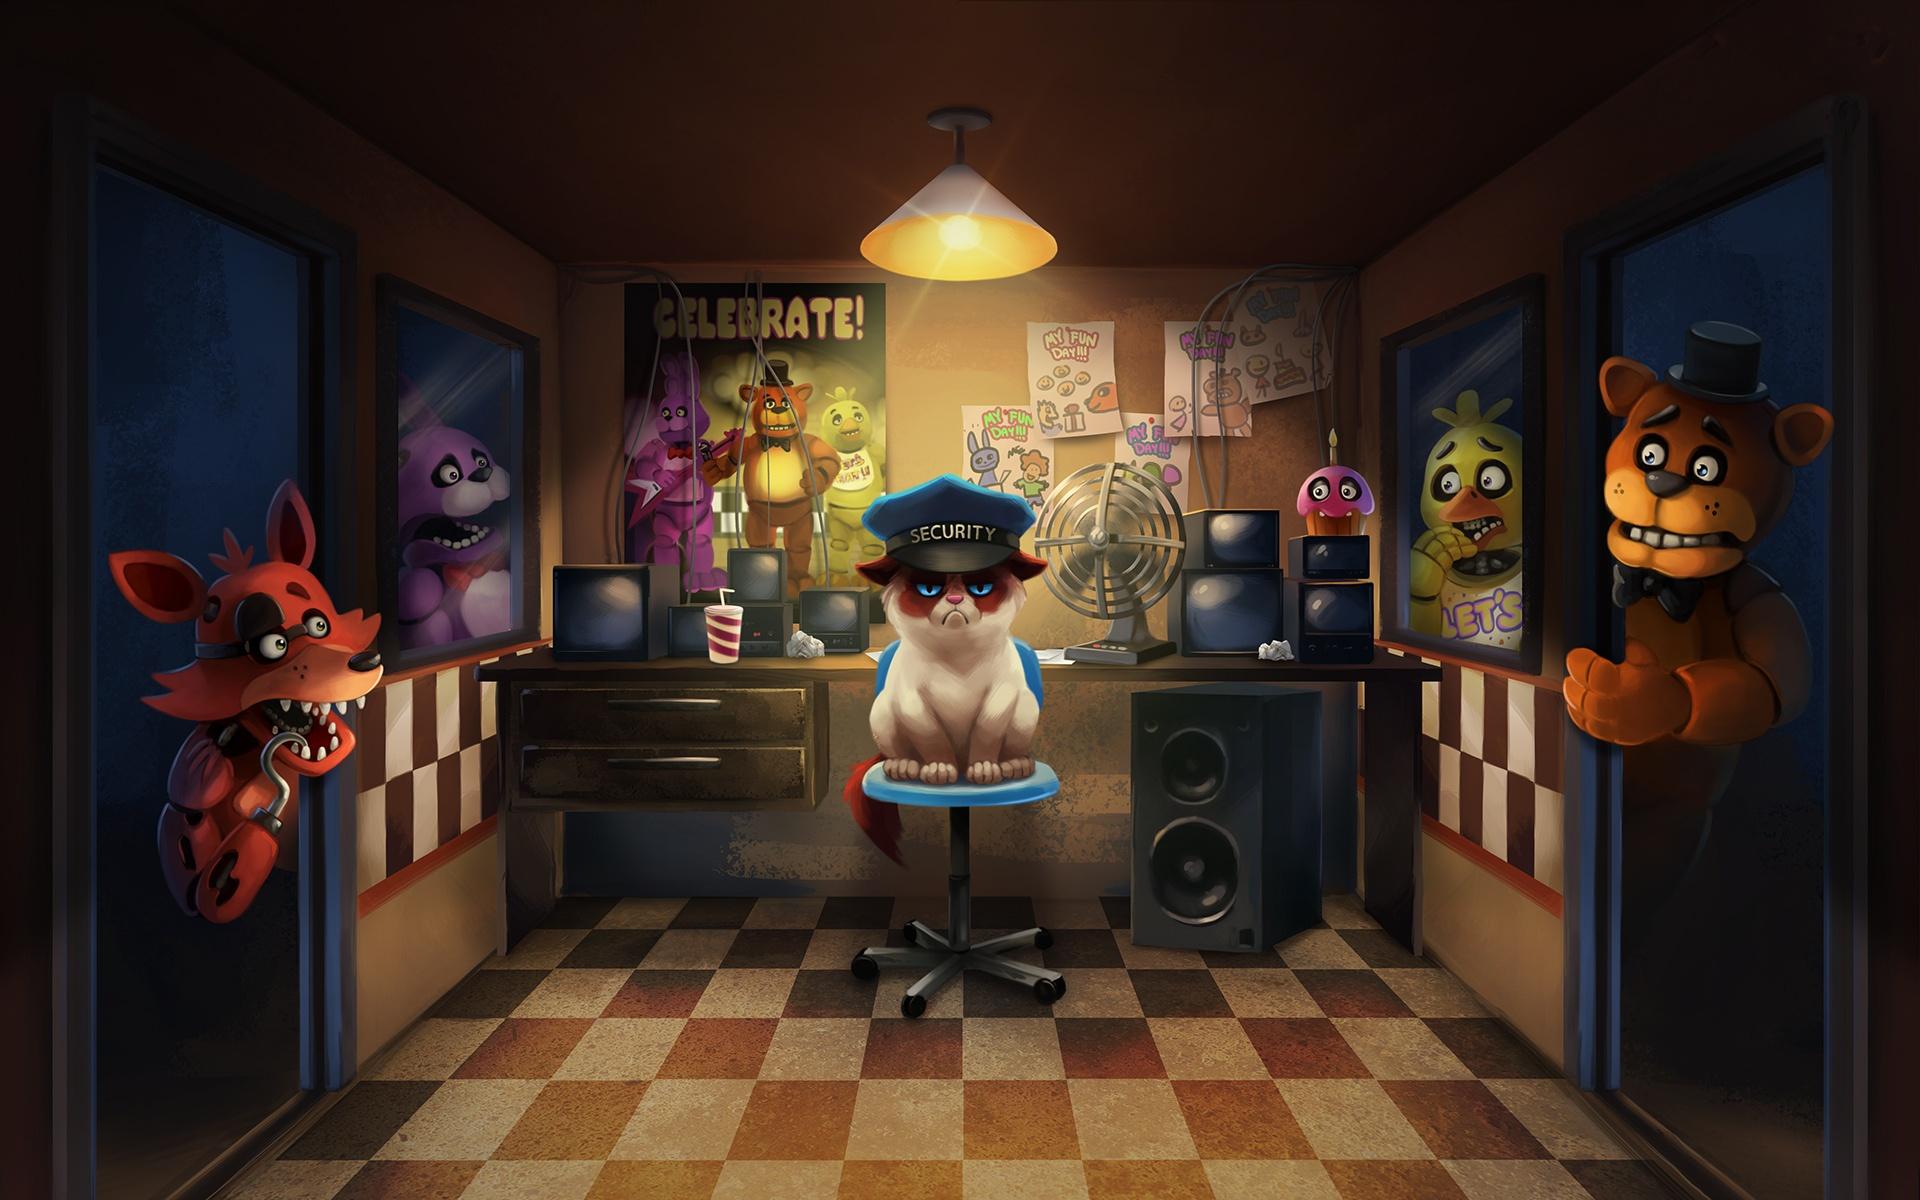 Wallpapers Five Nights at Freddy's - WallpaperSafari